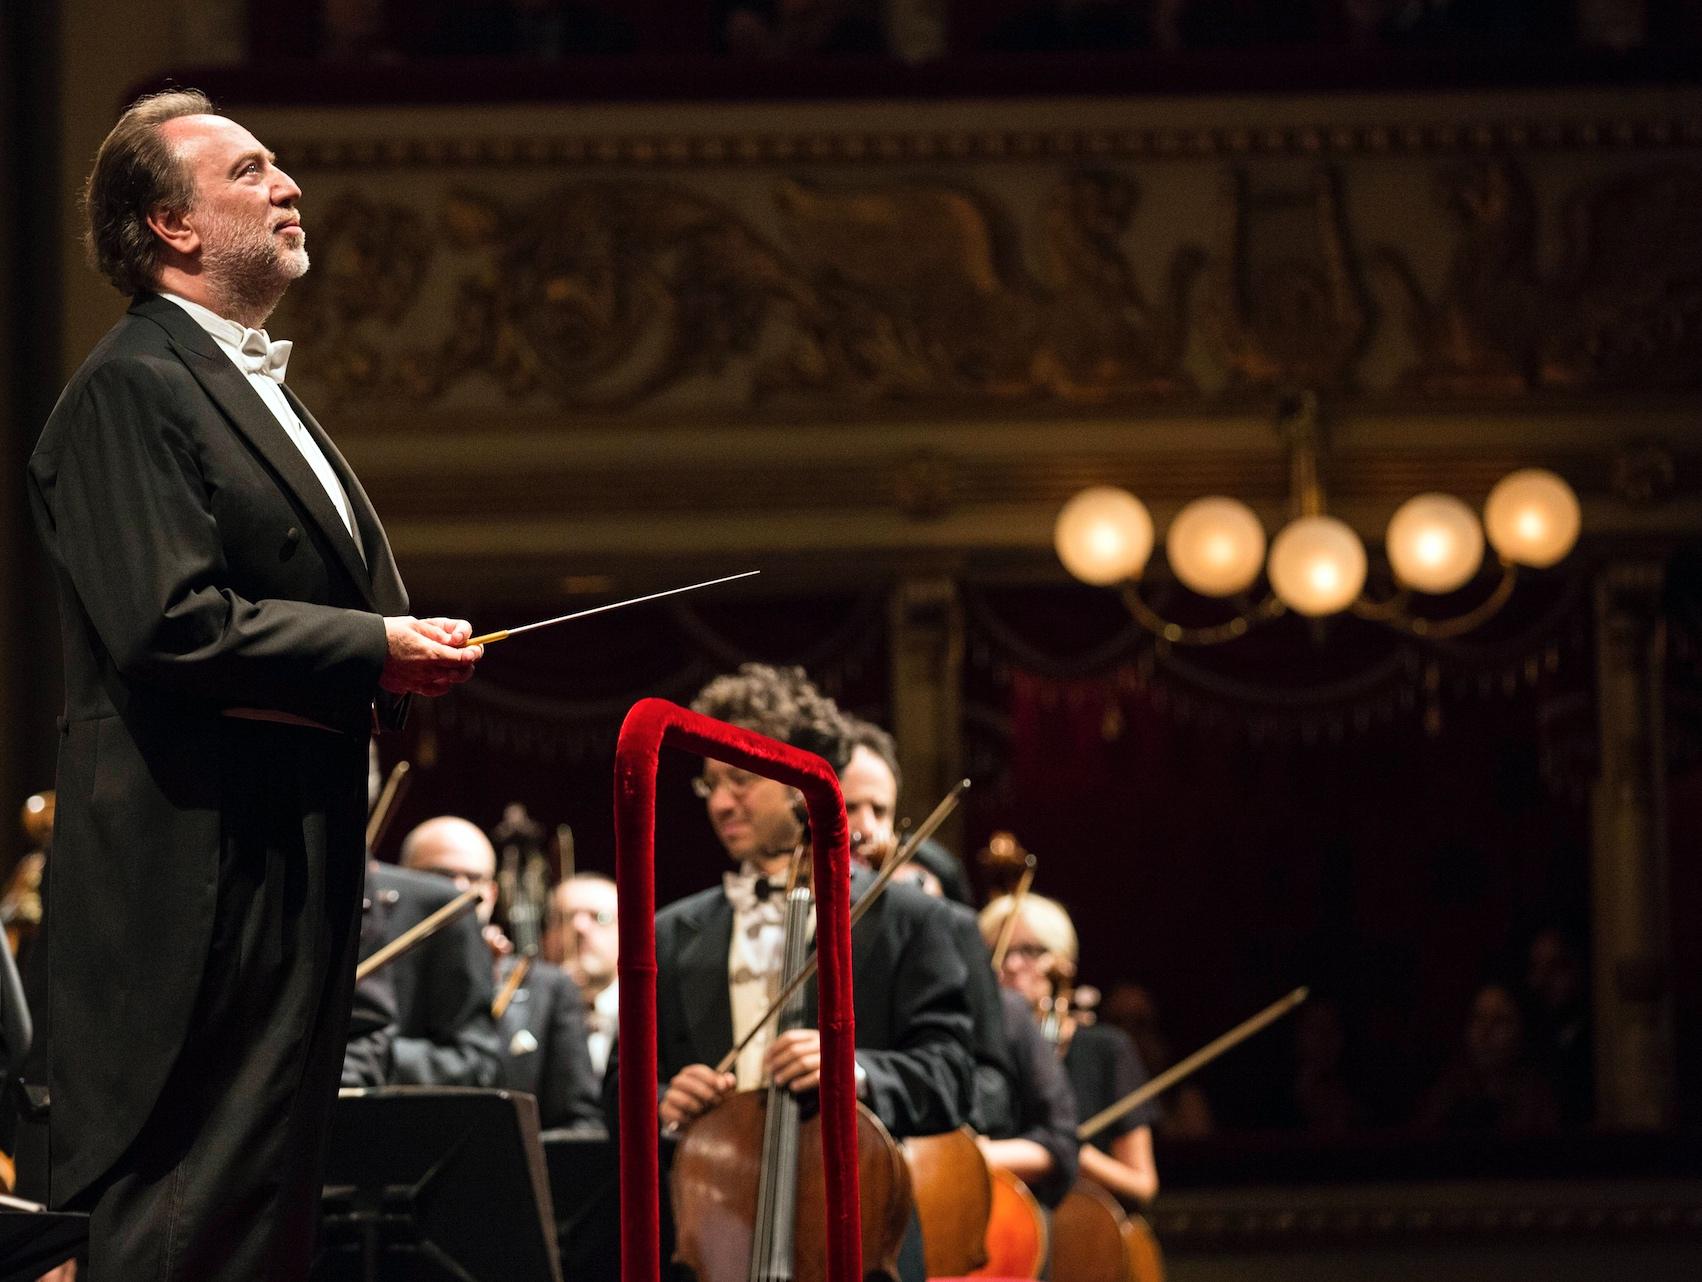 Riccardo Chailly; Filarmonica della Scala; Teatro alla Scala; Milano; Gustav Mahler; Sinfonia n.5